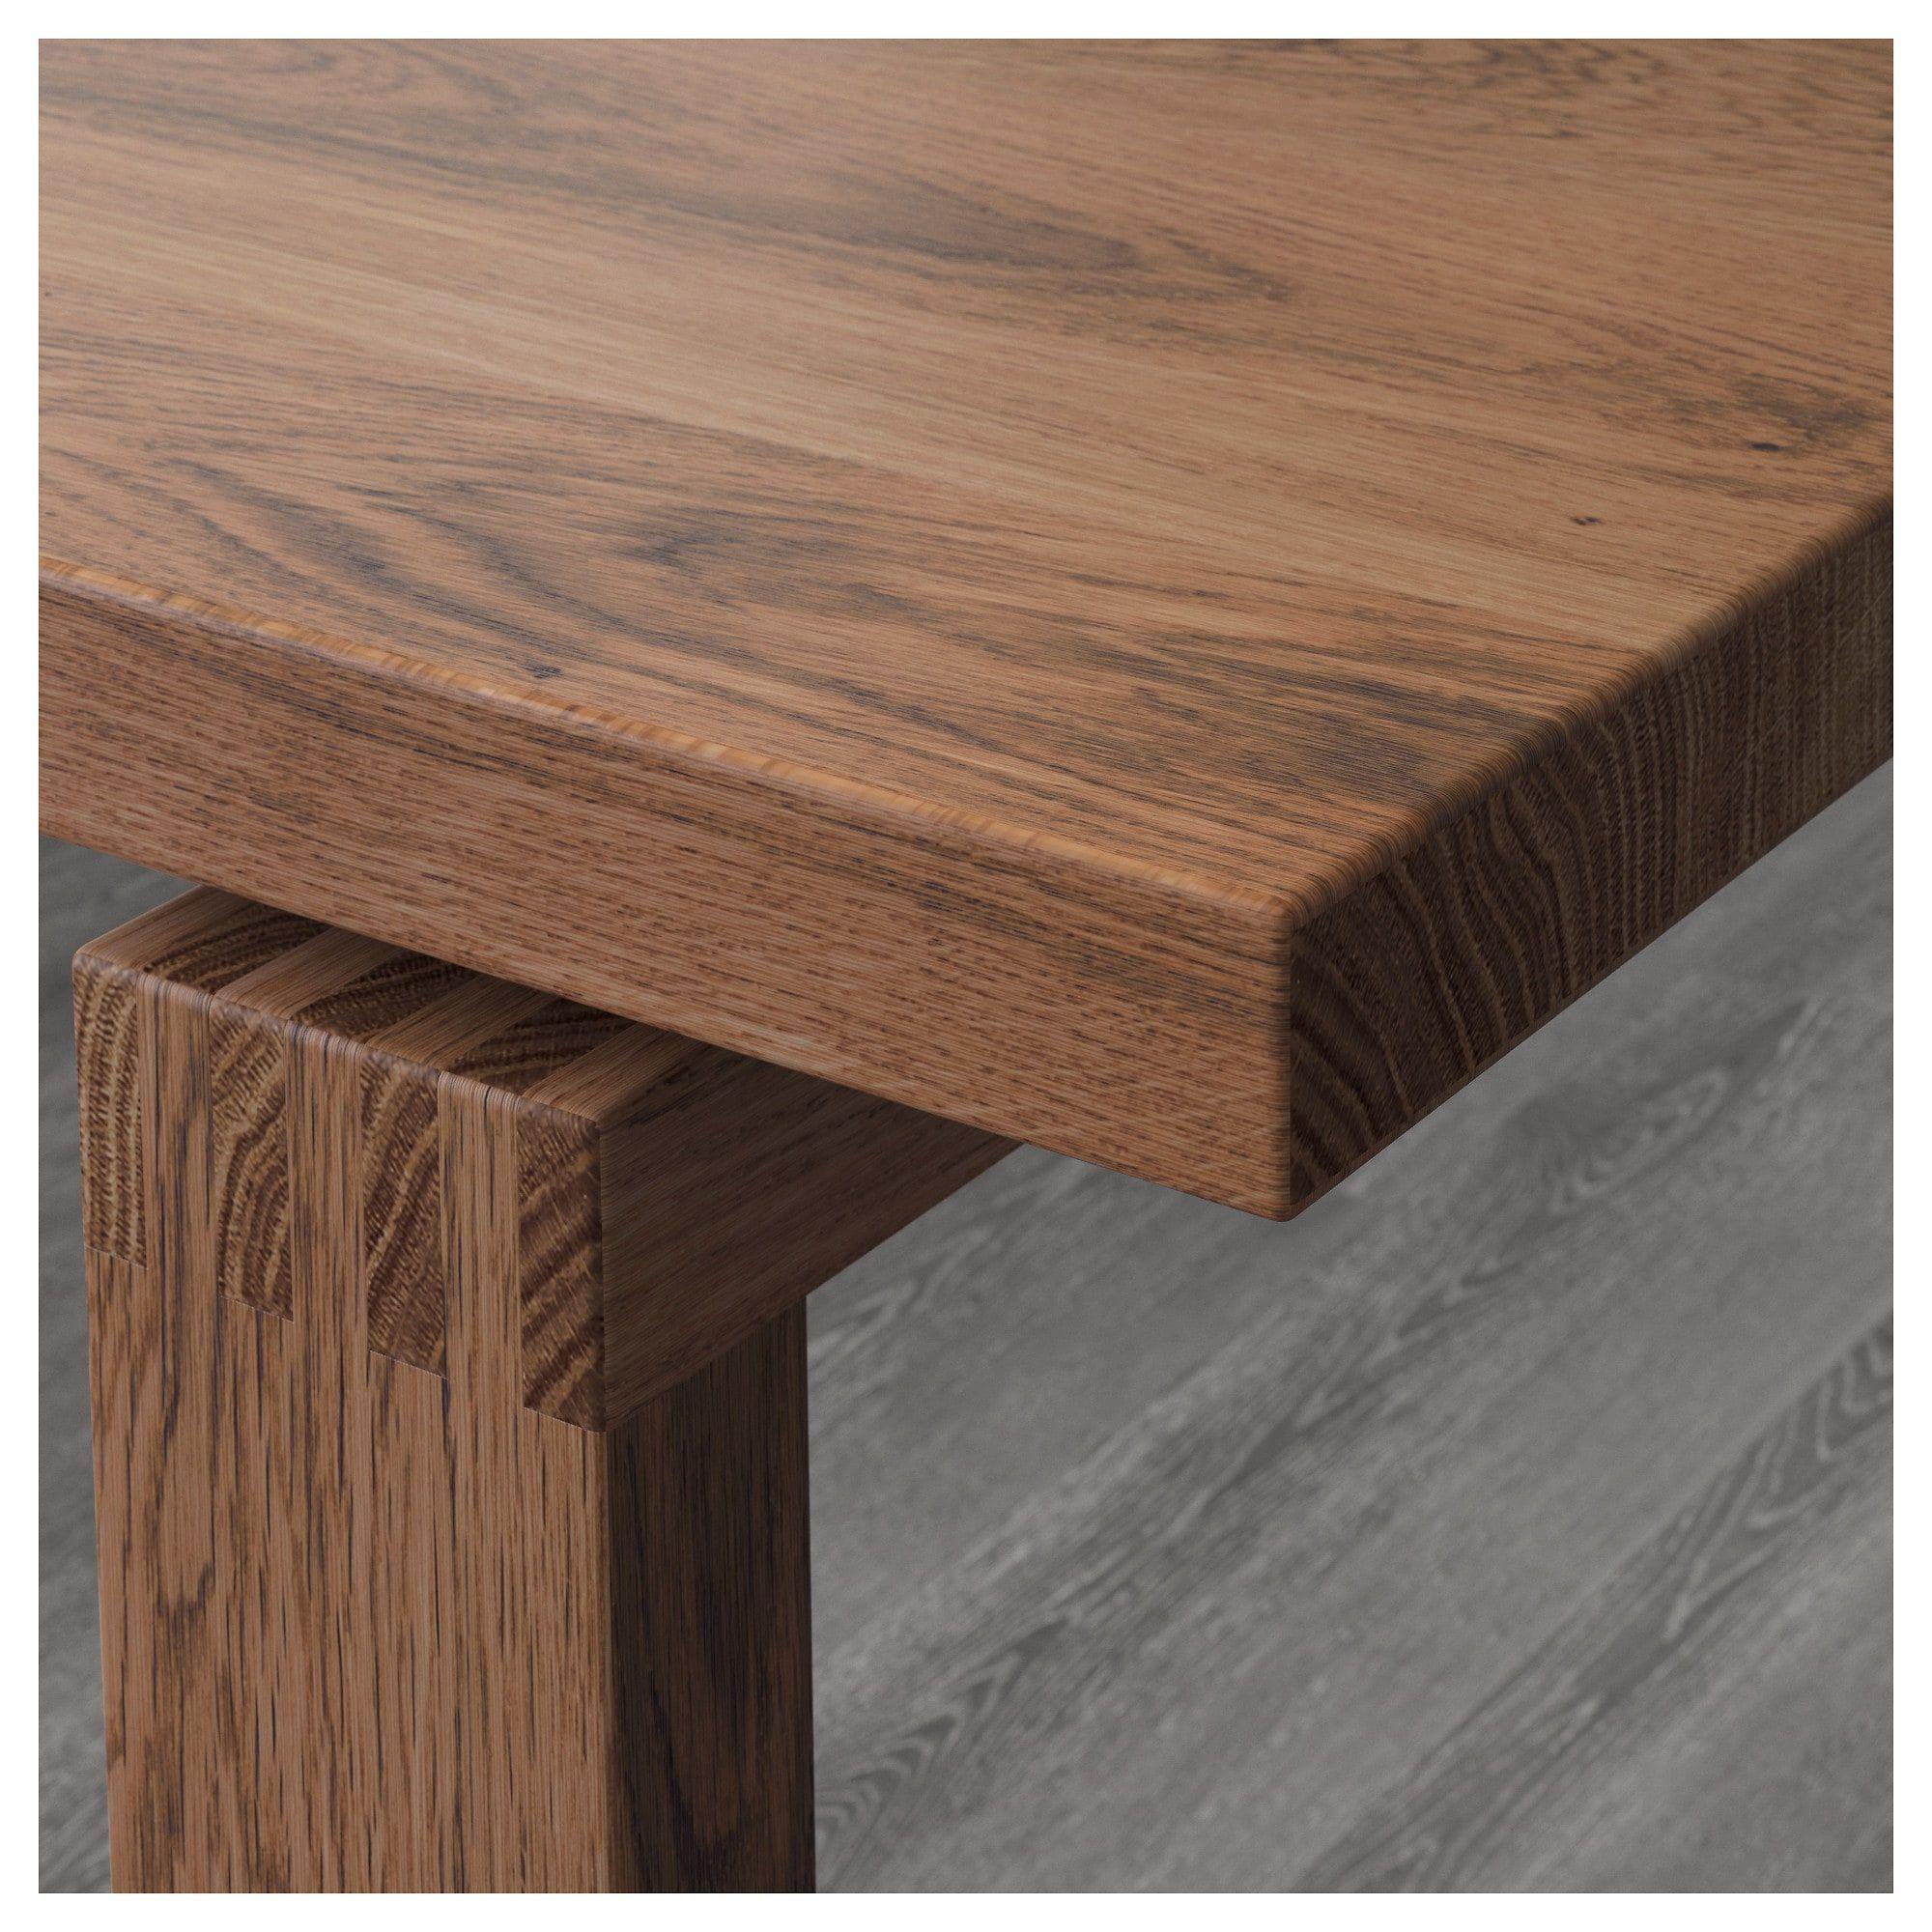 IKEA MORBYLANGA OAK Veneer Brown Stained Table Ikea